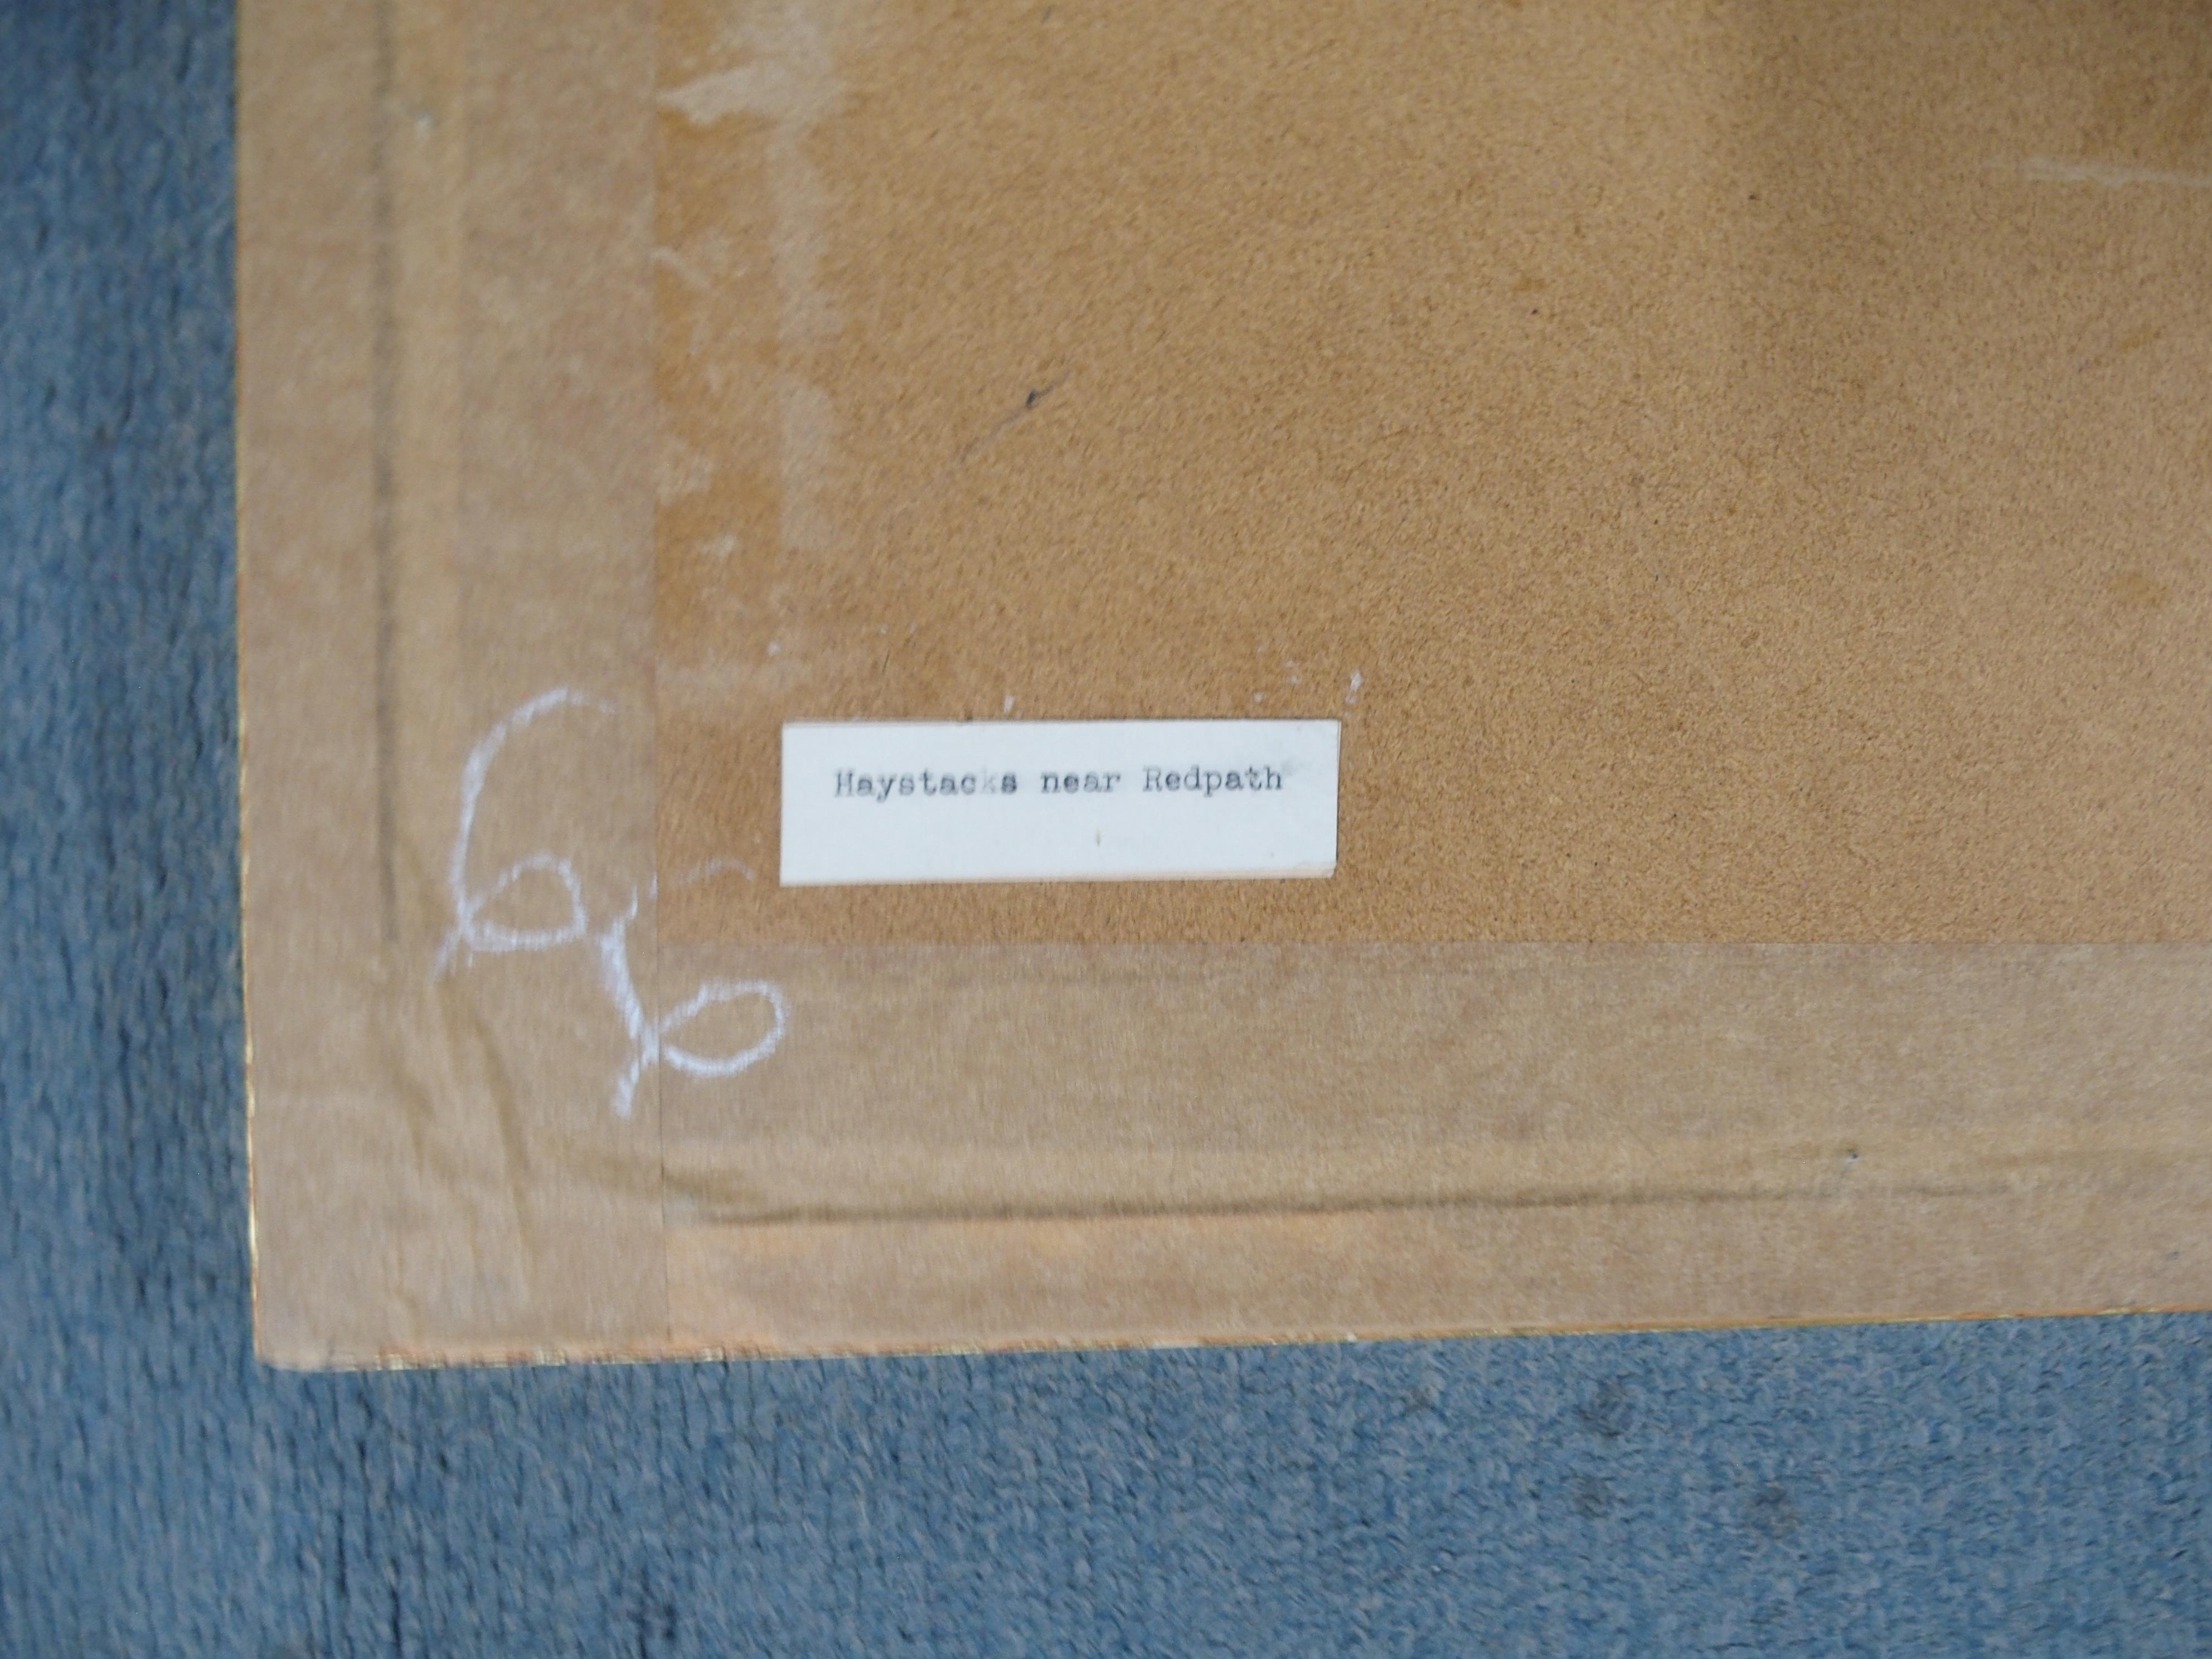 *WITHDRAWN* •EARL HAIG OBE, RSA (SCOTTISH 1918-2009) HAYSTACKS NEAR REDPATH Ink - Image 5 of 5